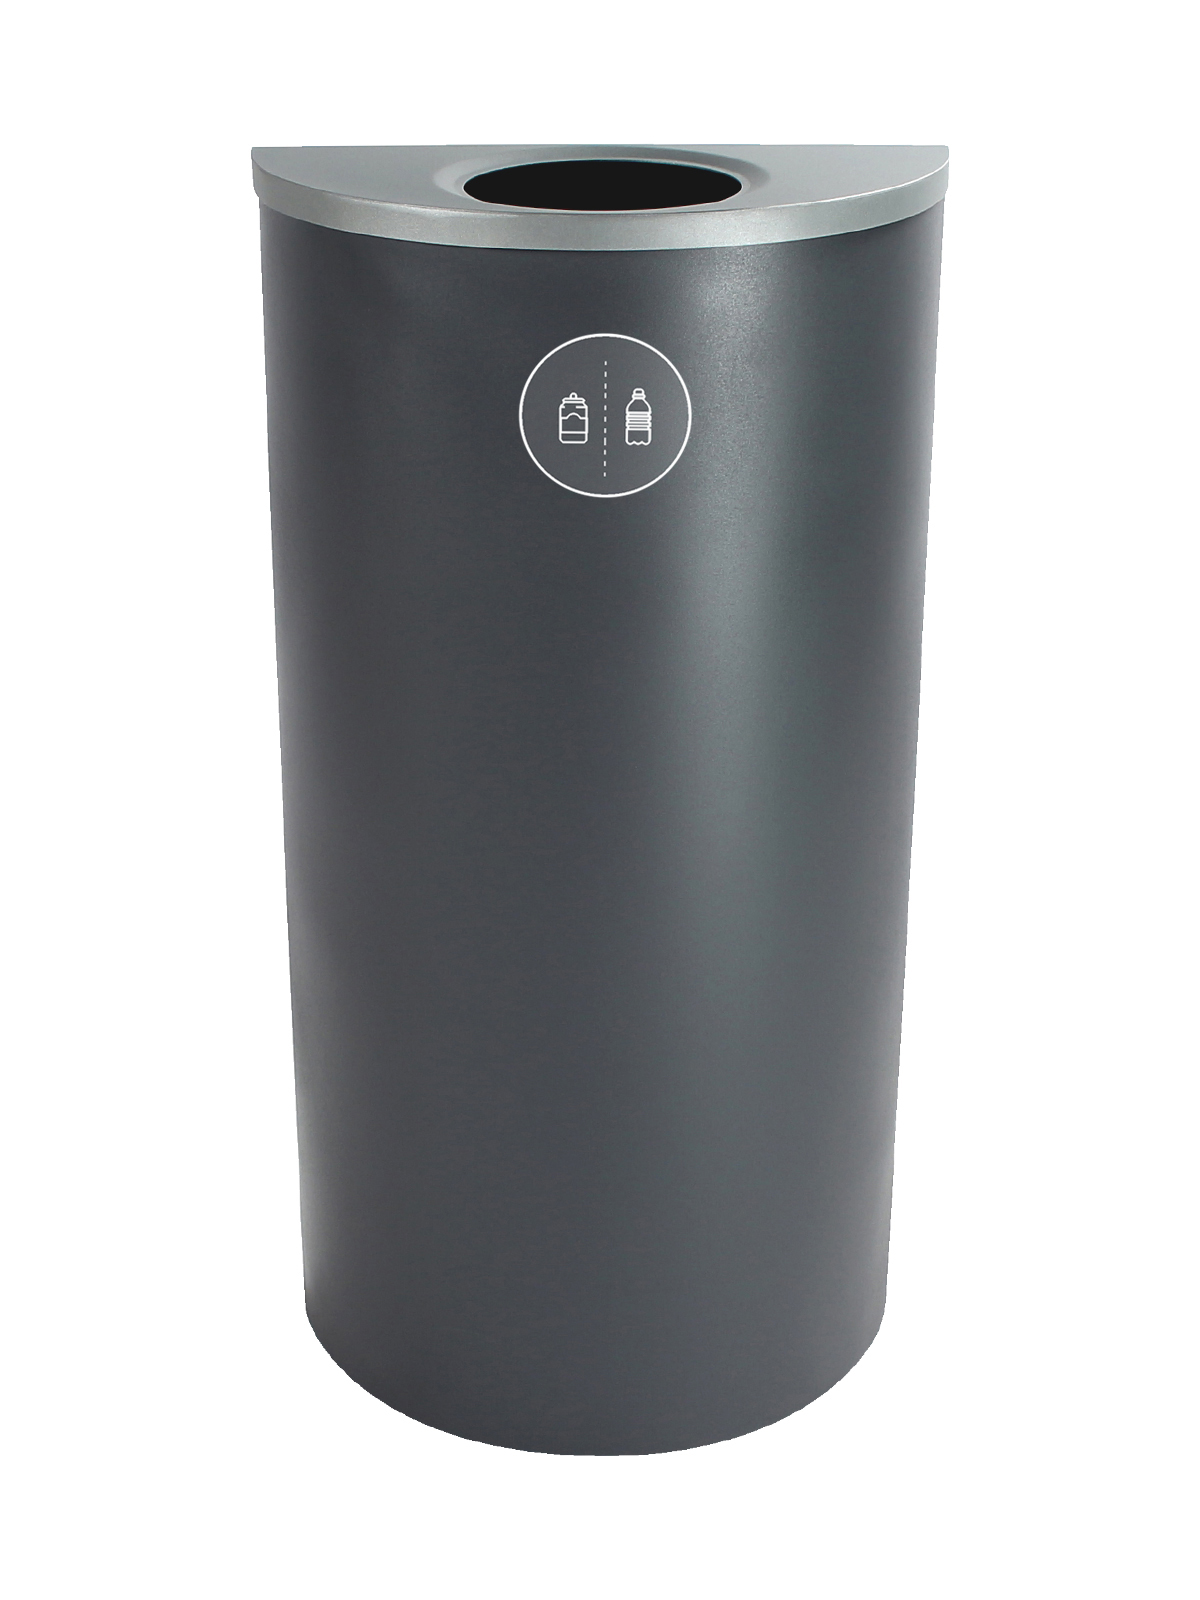 SPECTRUM - Single - Ellipse Slim - Cans & Bottles - Circle - Grey